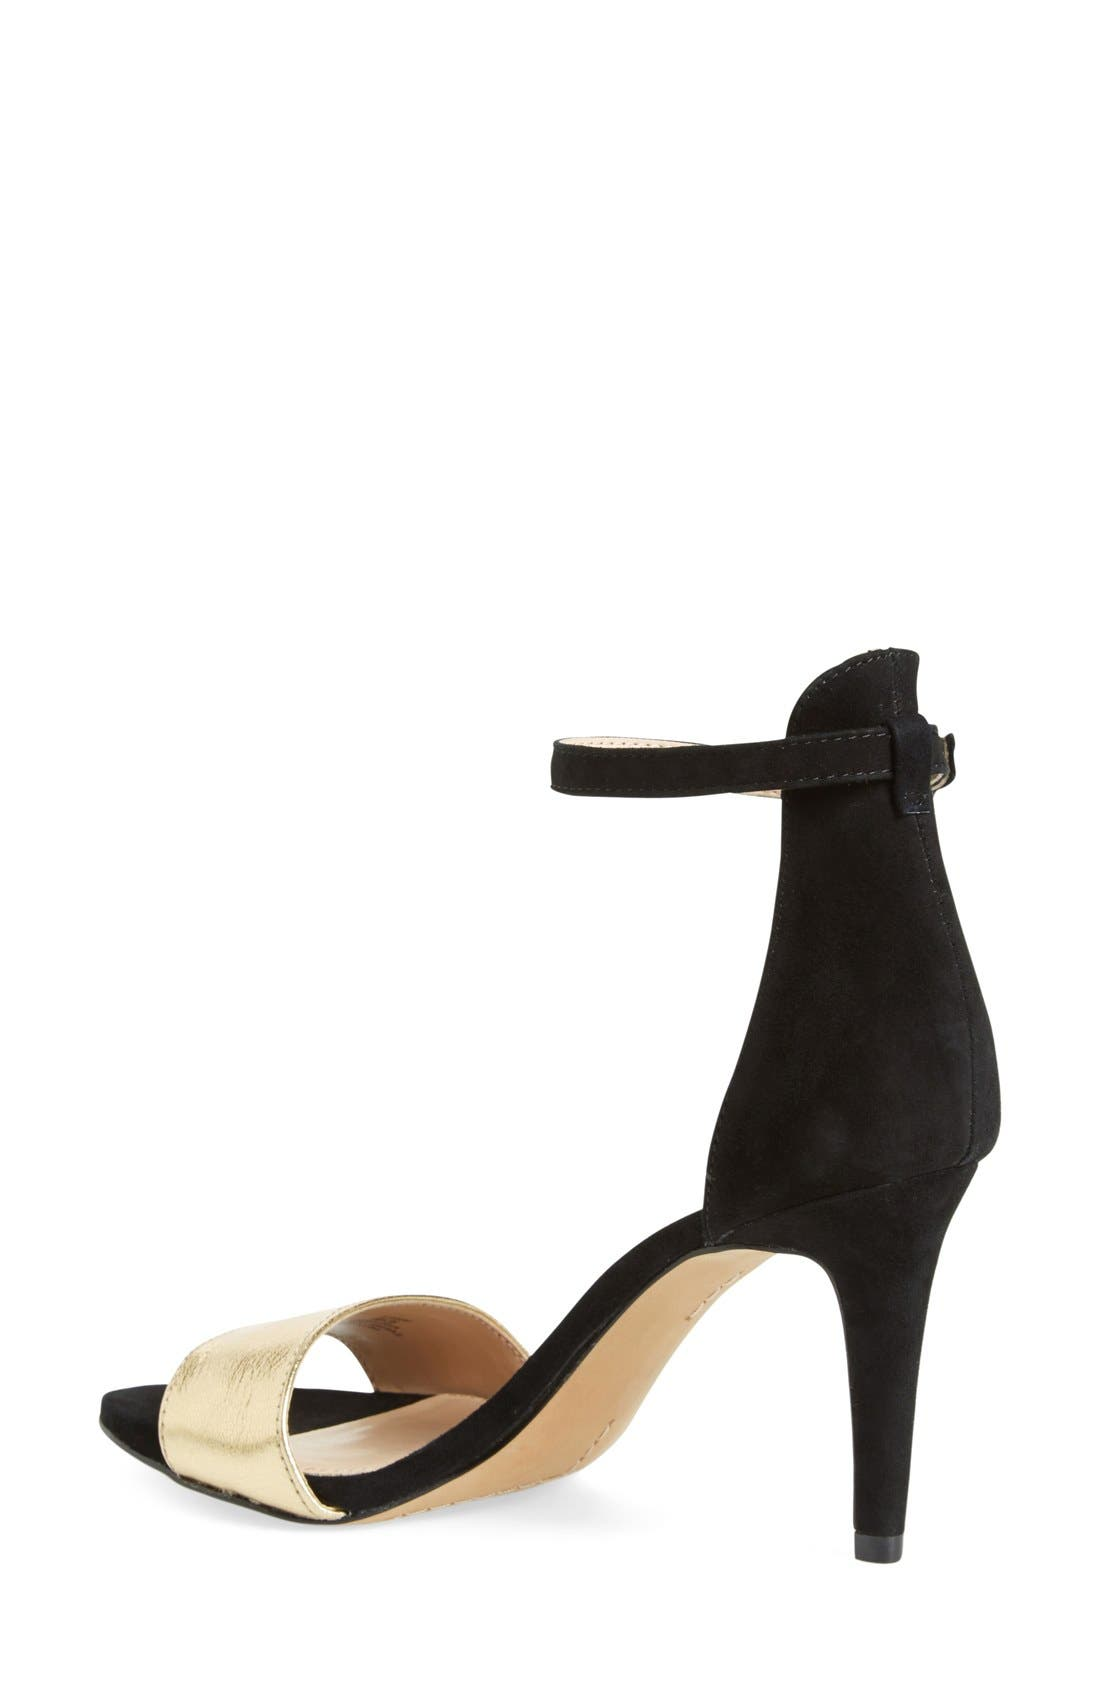 ,                             'Court' Ankle Strap Sandal,                             Alternate thumbnail 10, color,                             002